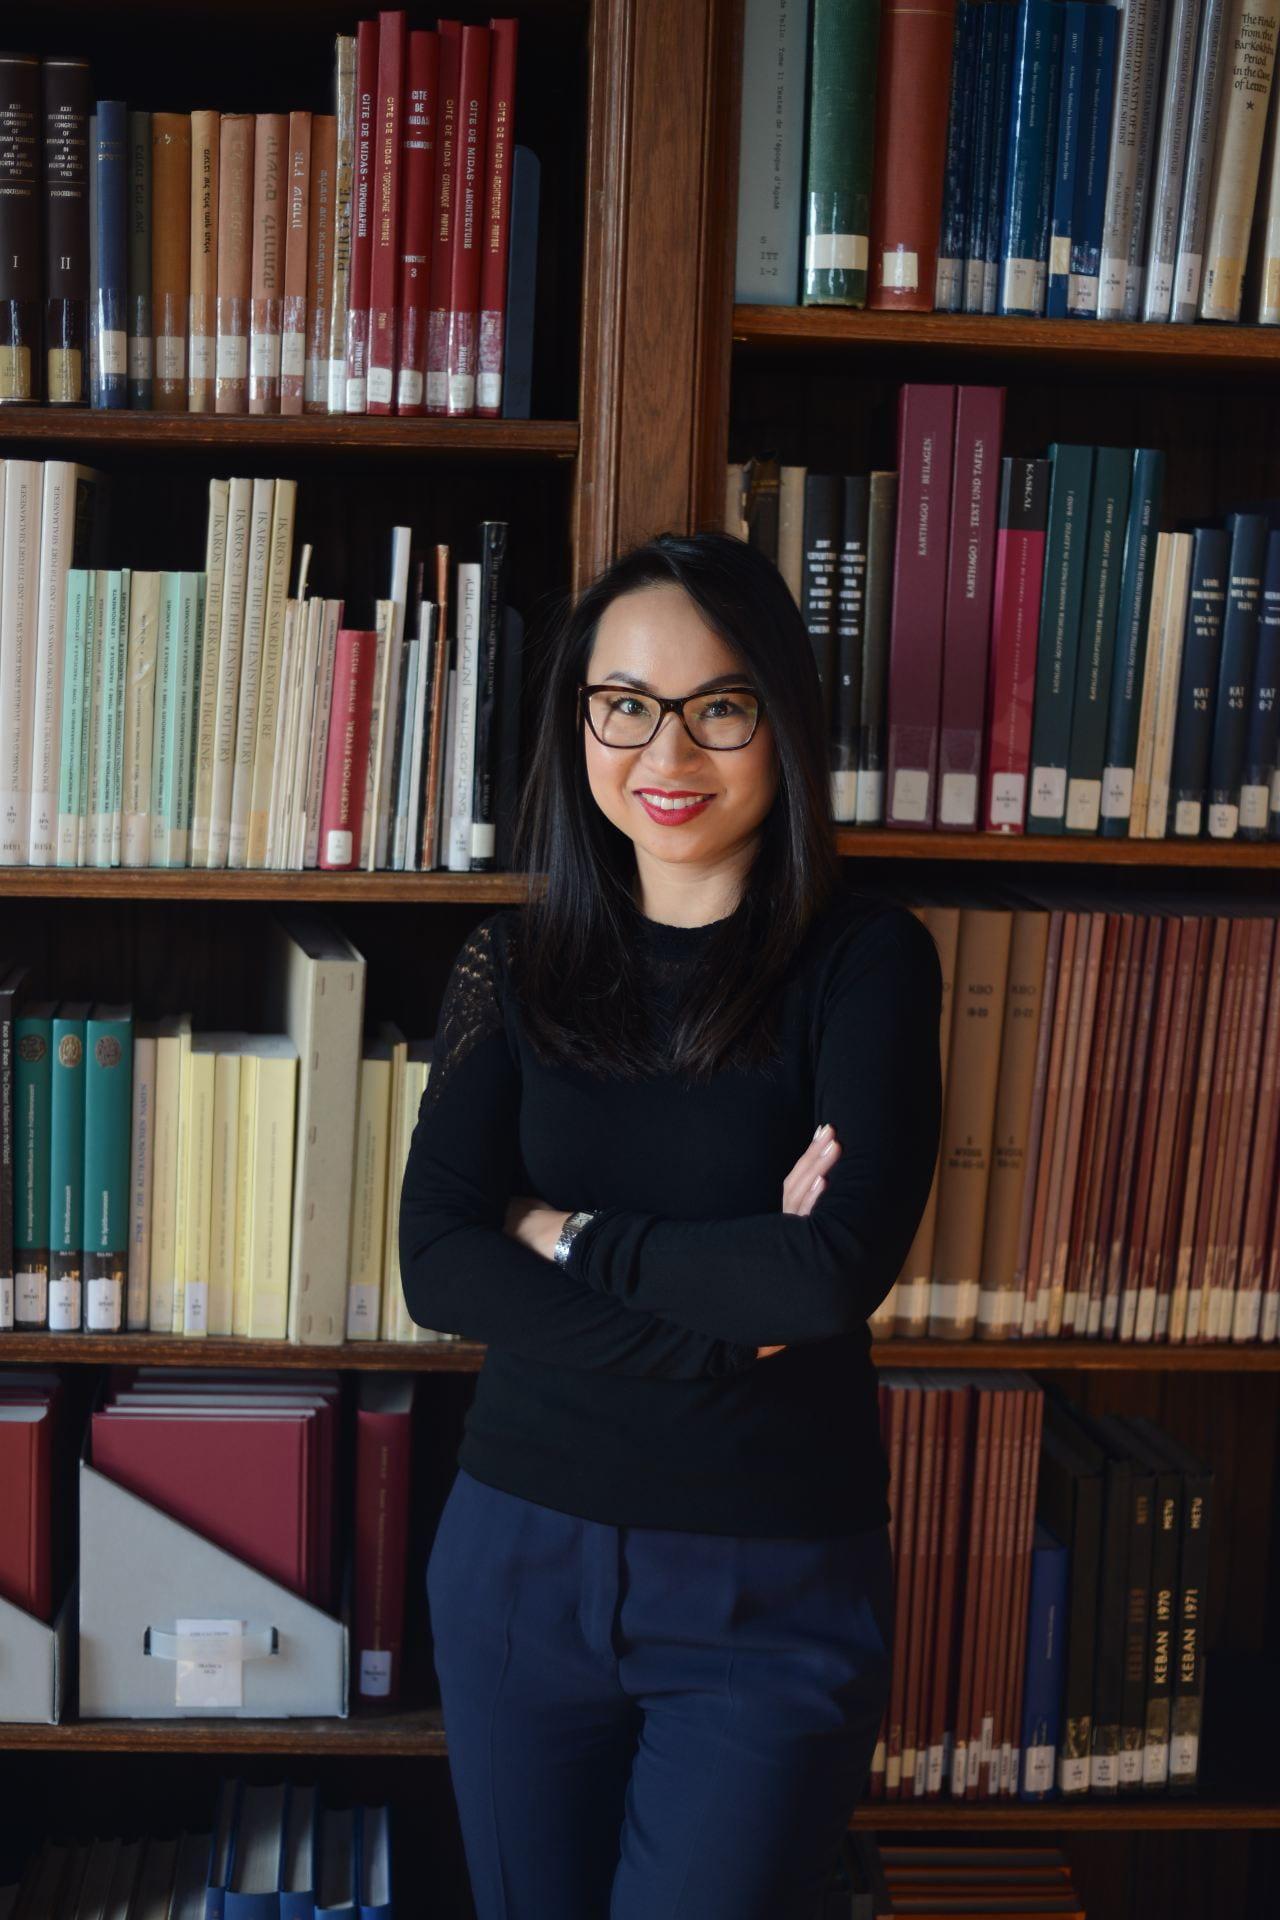 Headshot of Kimberly Kay Hoang